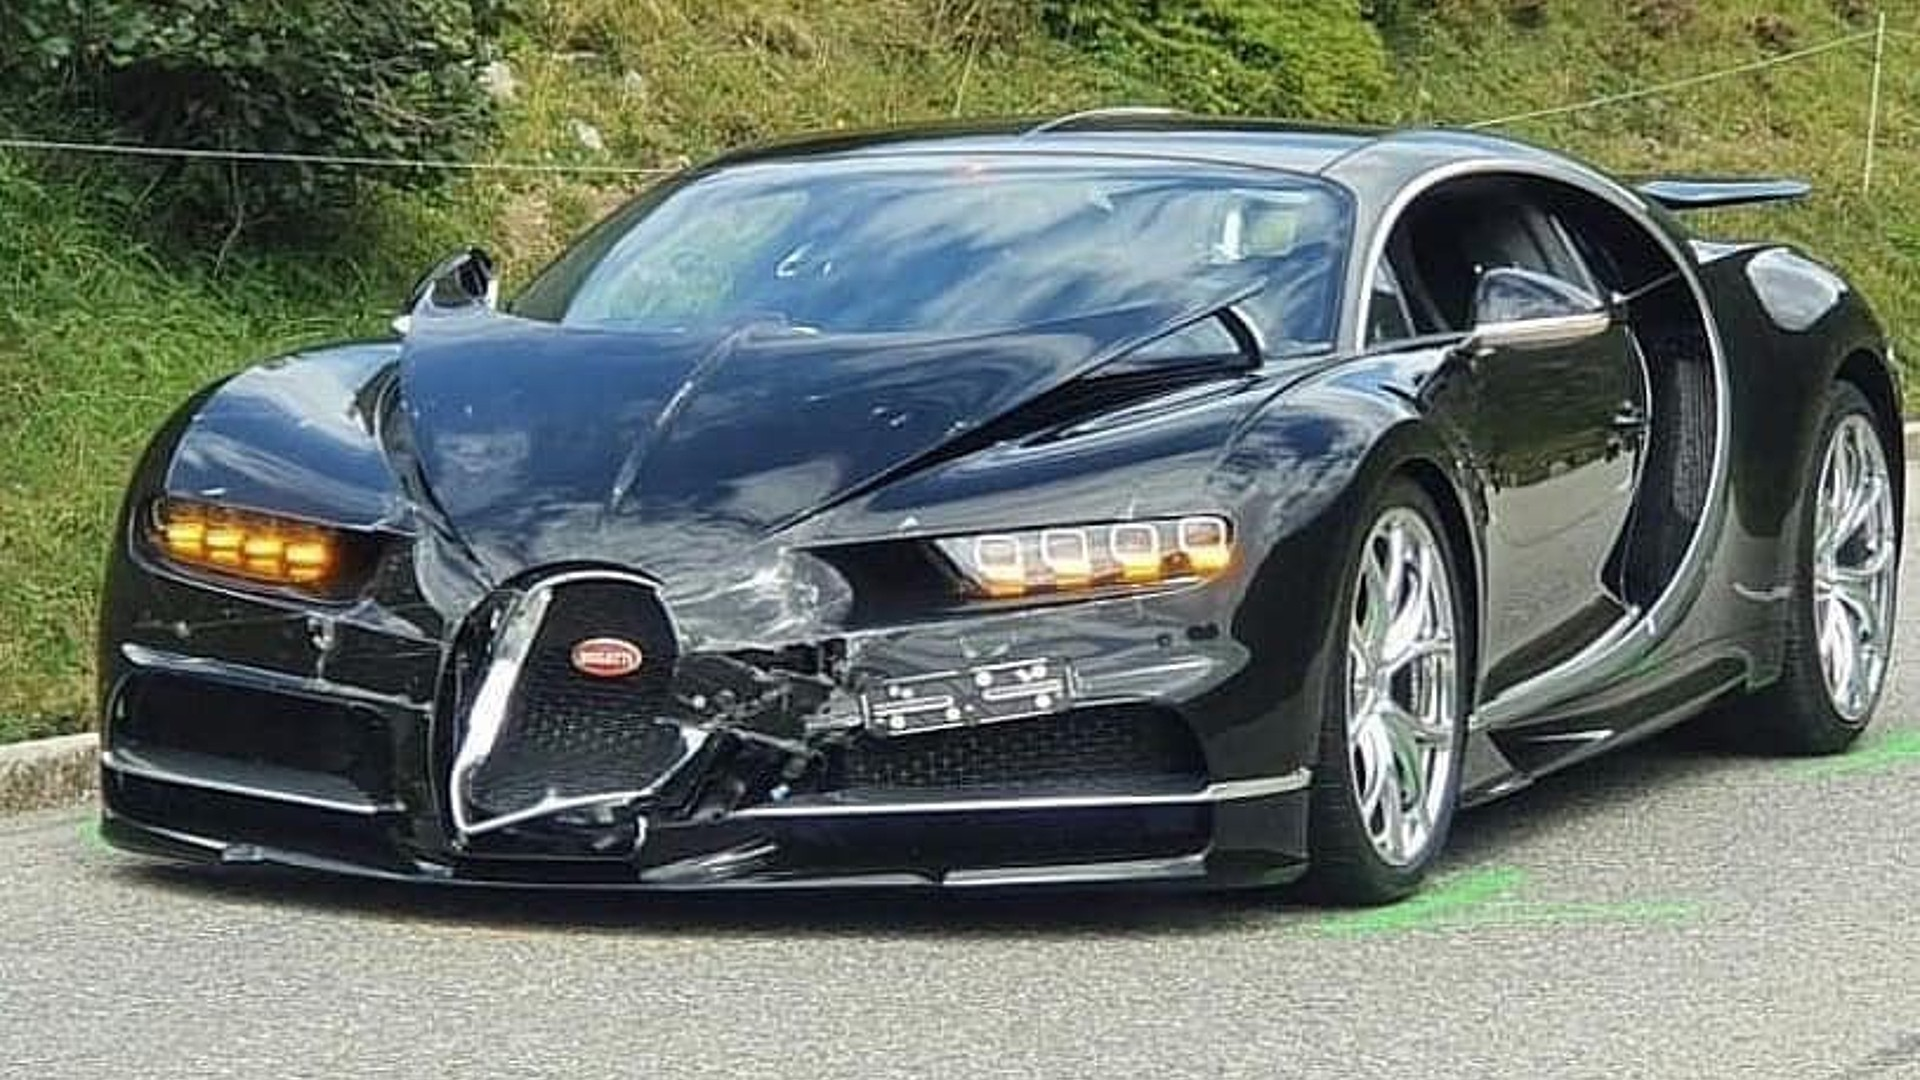 Bugatti τράκαρε με Porsche στο ακριβότερο τροχαίο της χρονιάς! [vid]